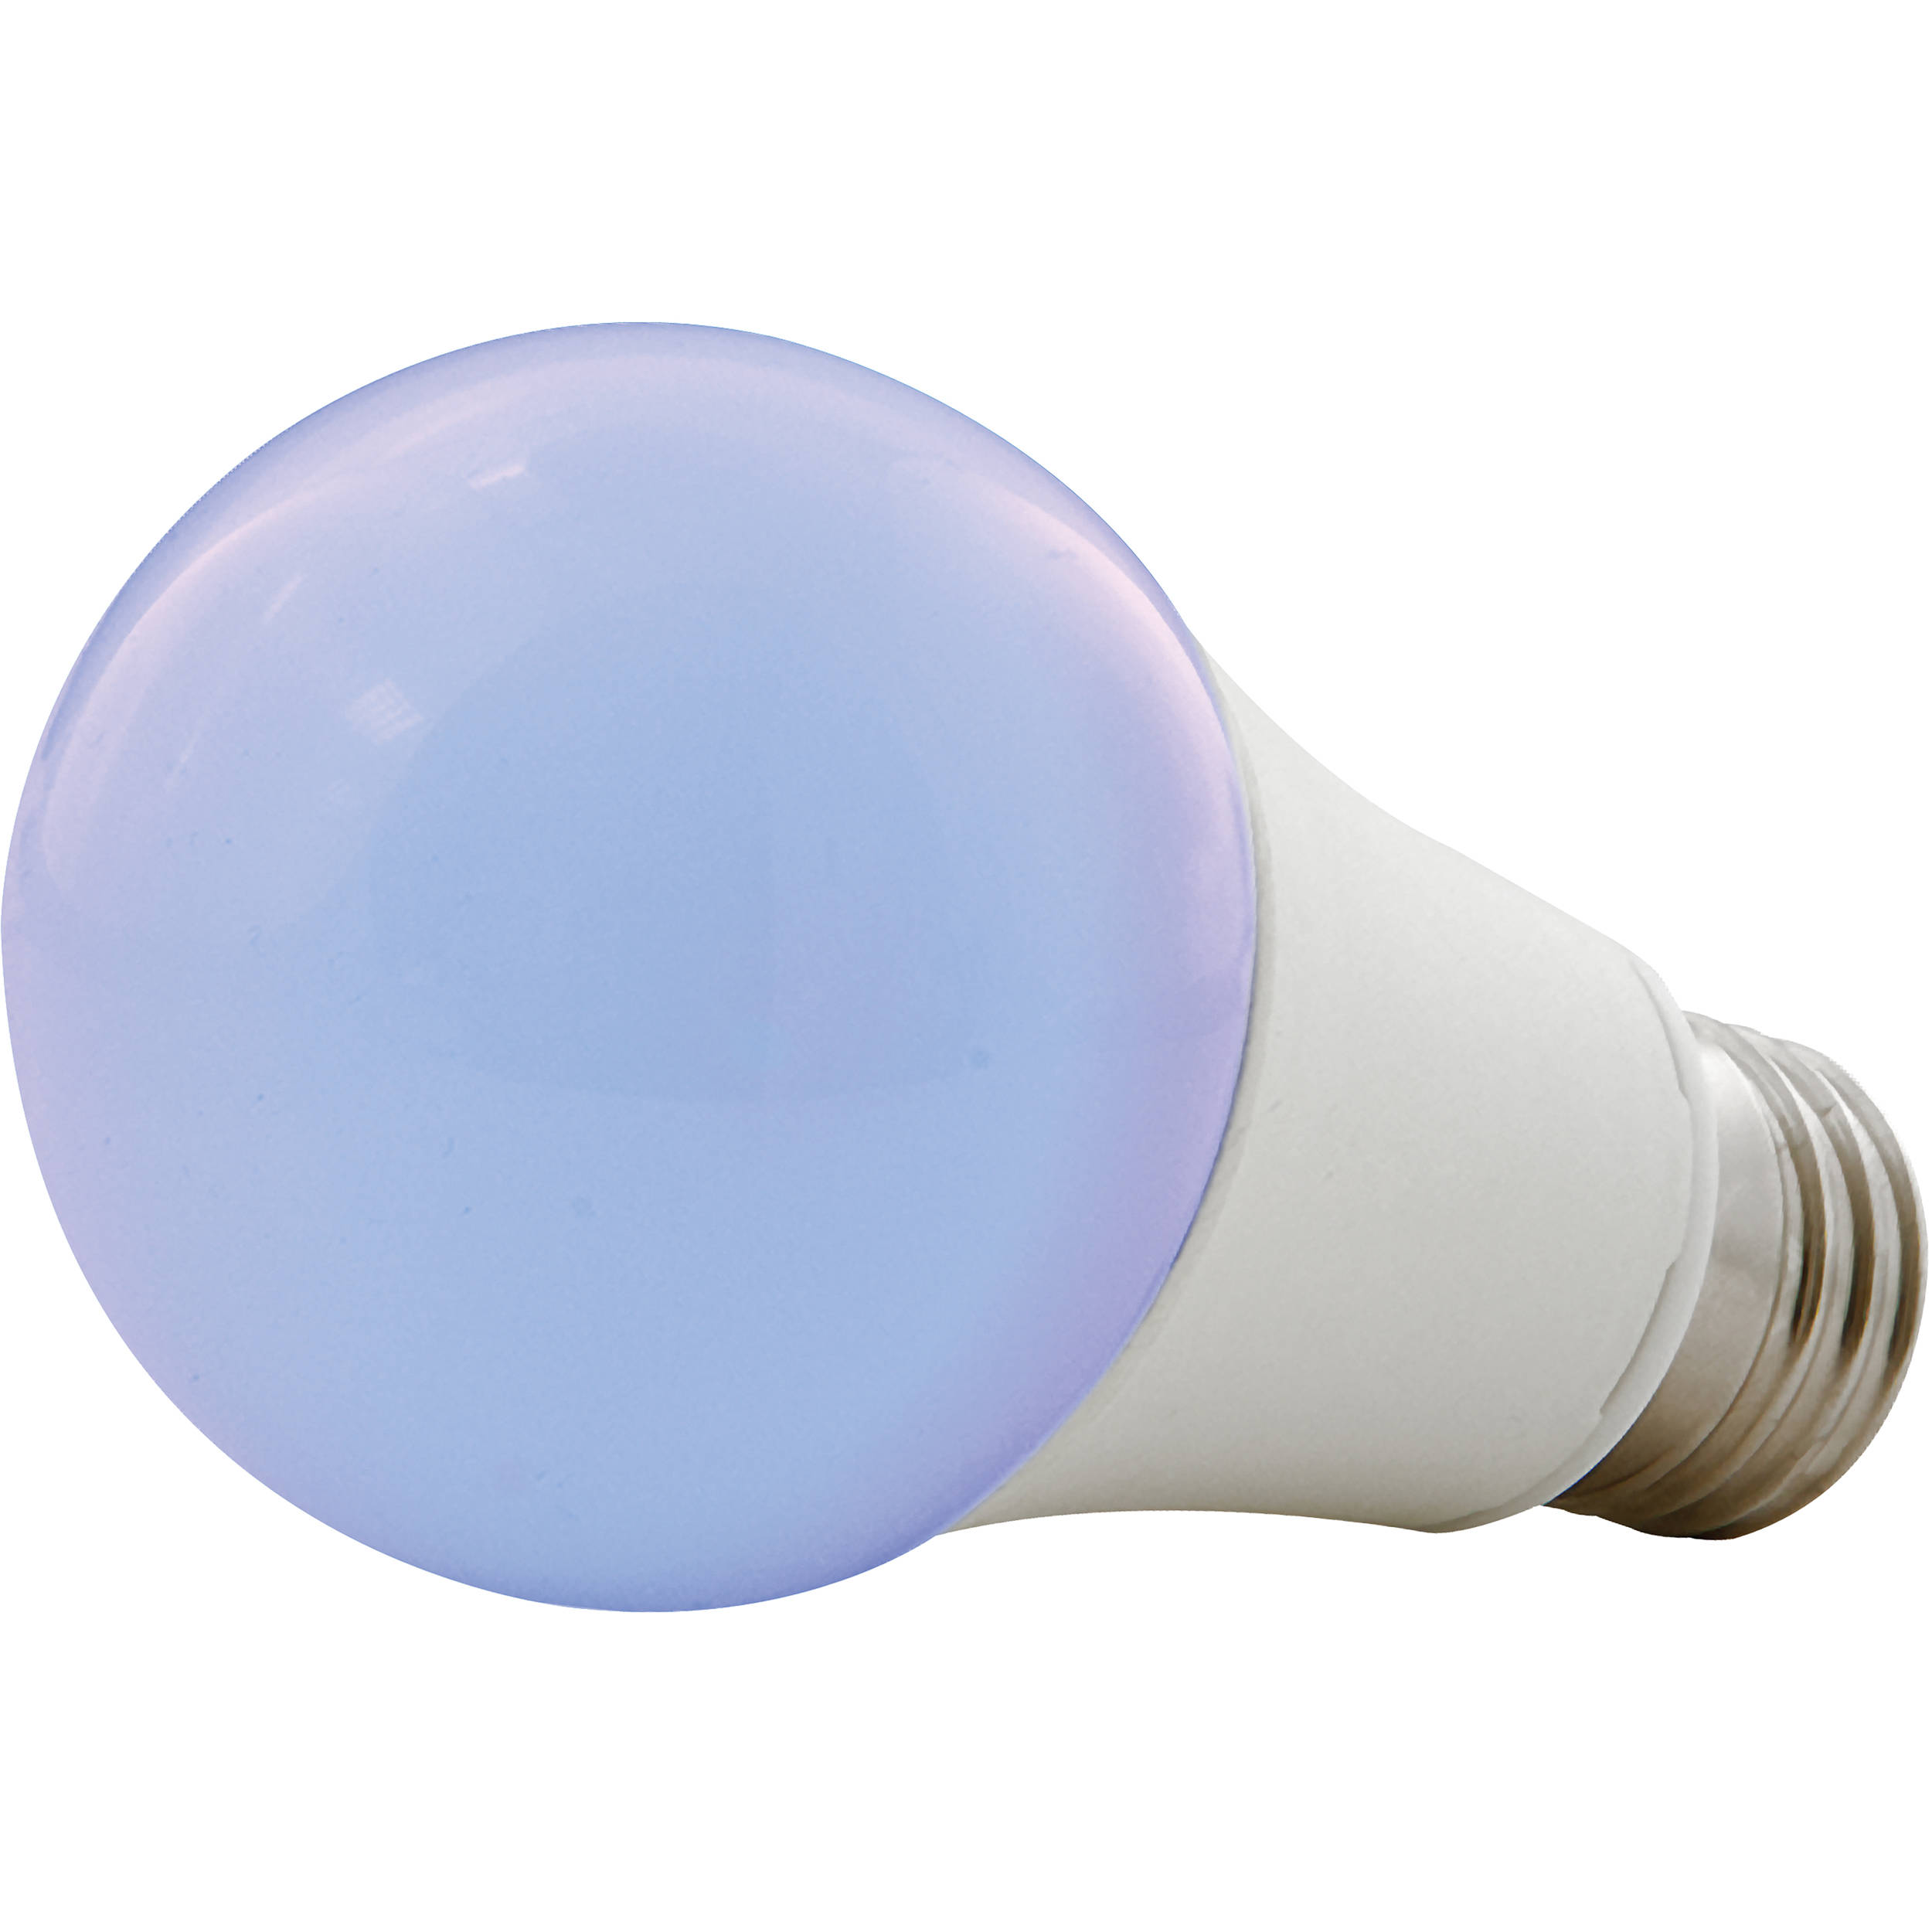 American Dj Blb7w Ultraviolet Led Blacklight Bulb Blb7w B H